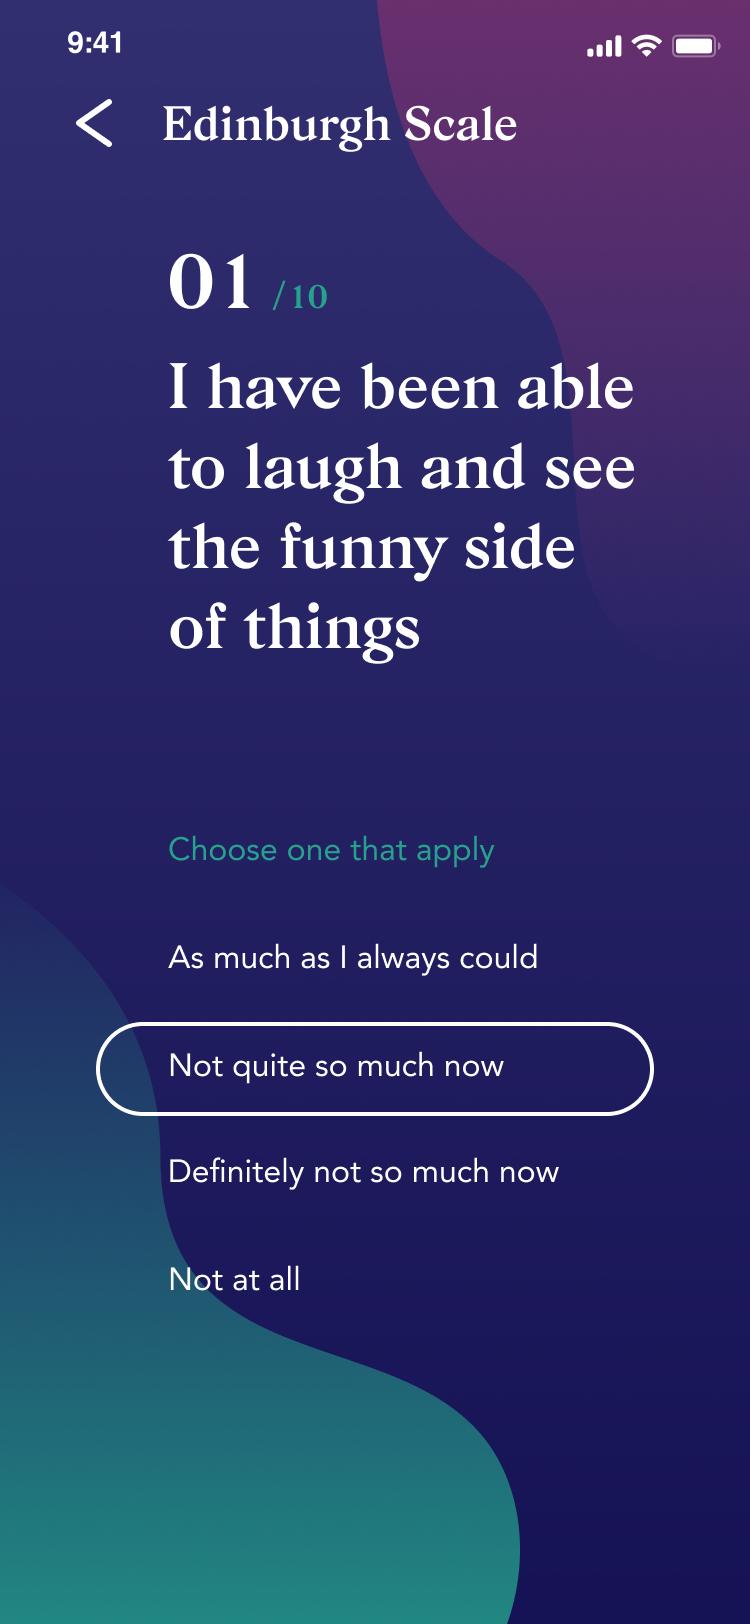 Edinburgh Survey Example Selected.png